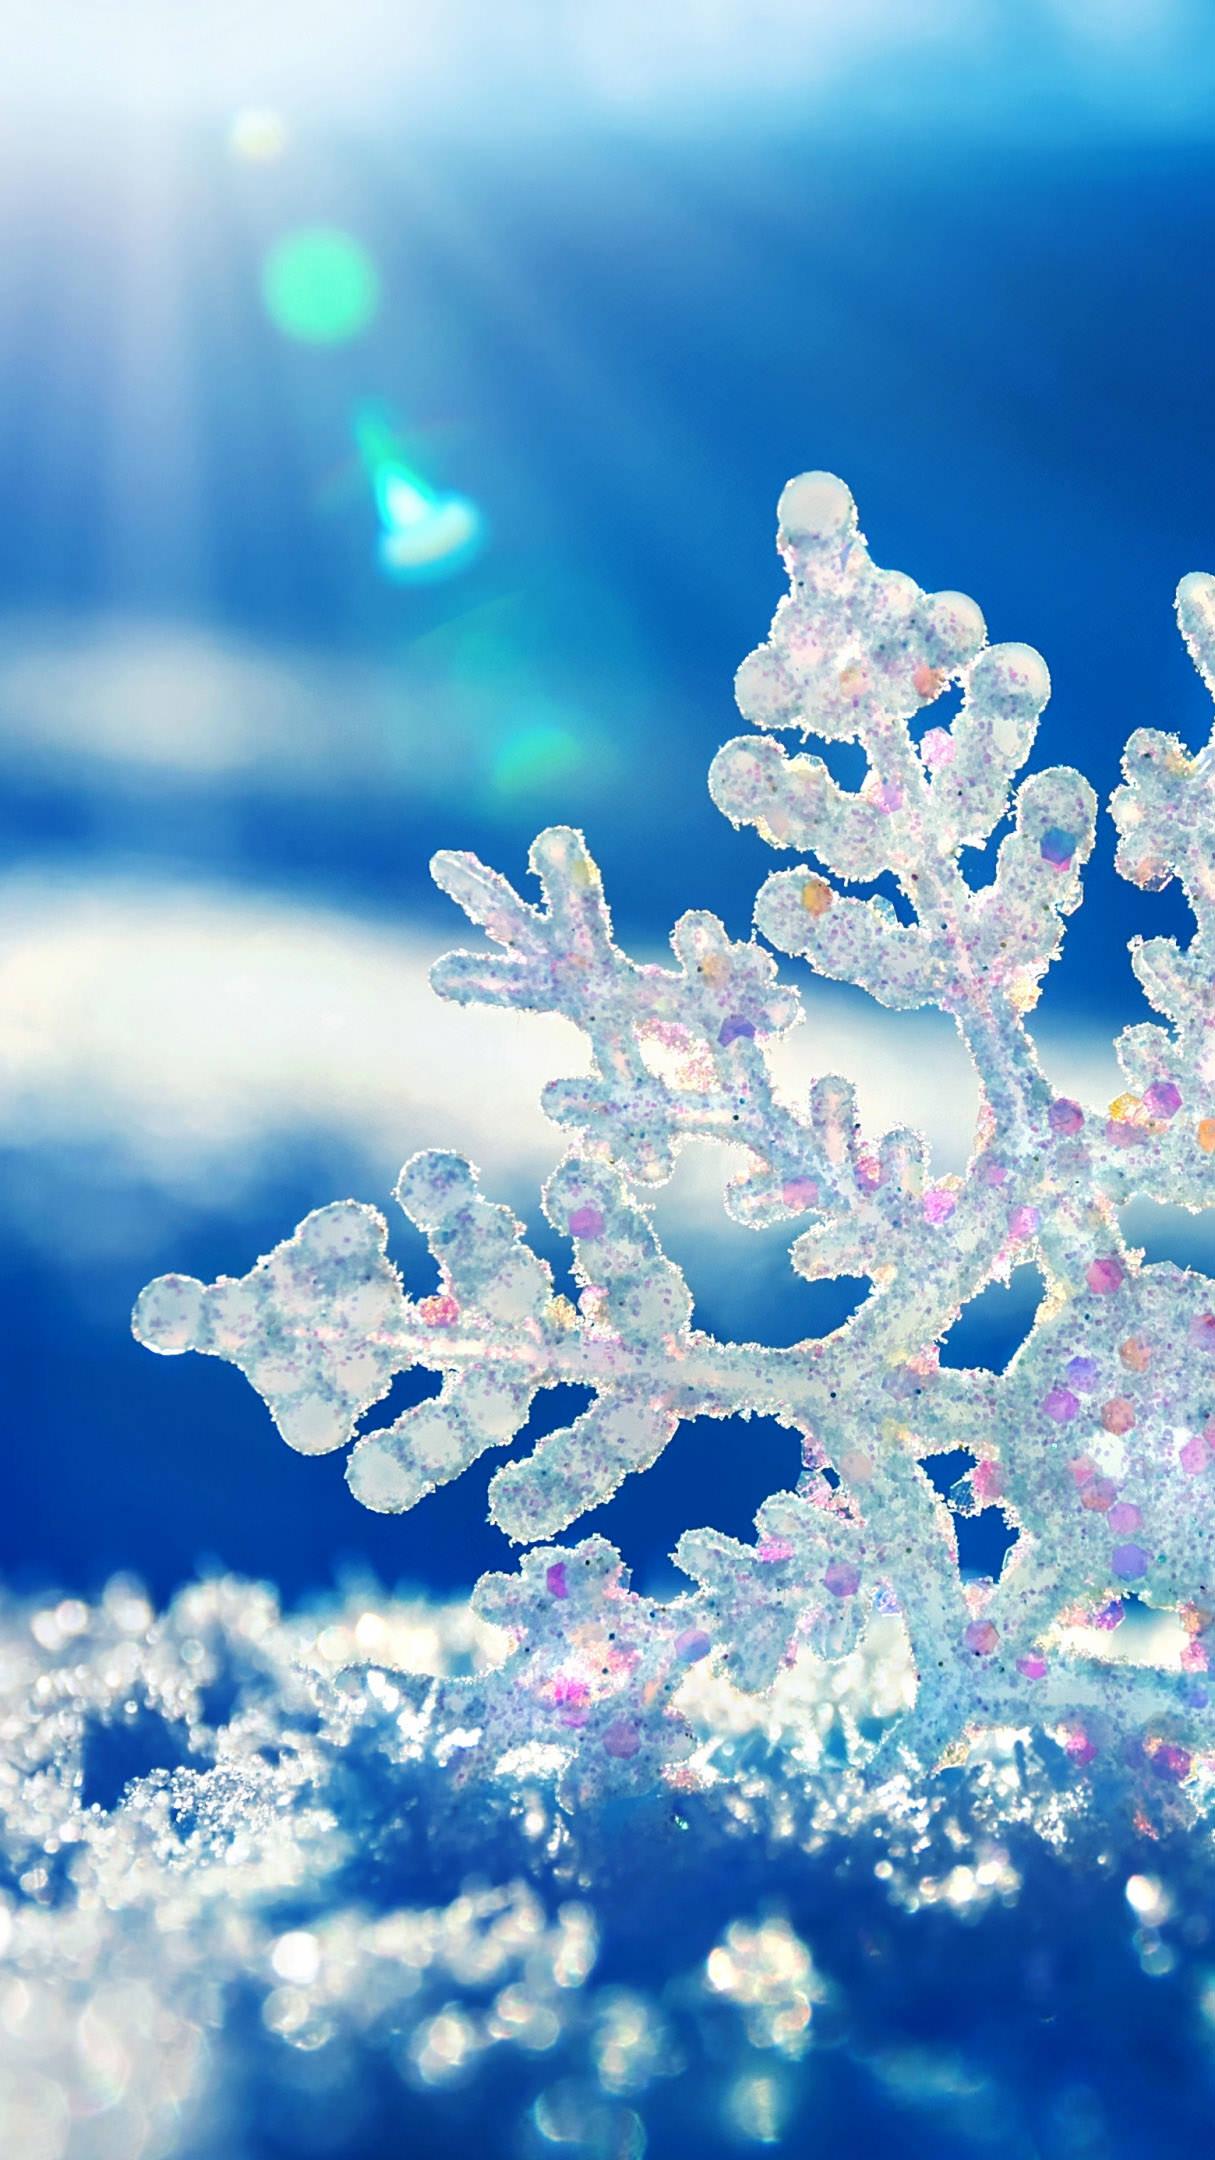 Superb Iphone Snow Snowflake. Iphone Snow Snowflake Winter Wallpaper